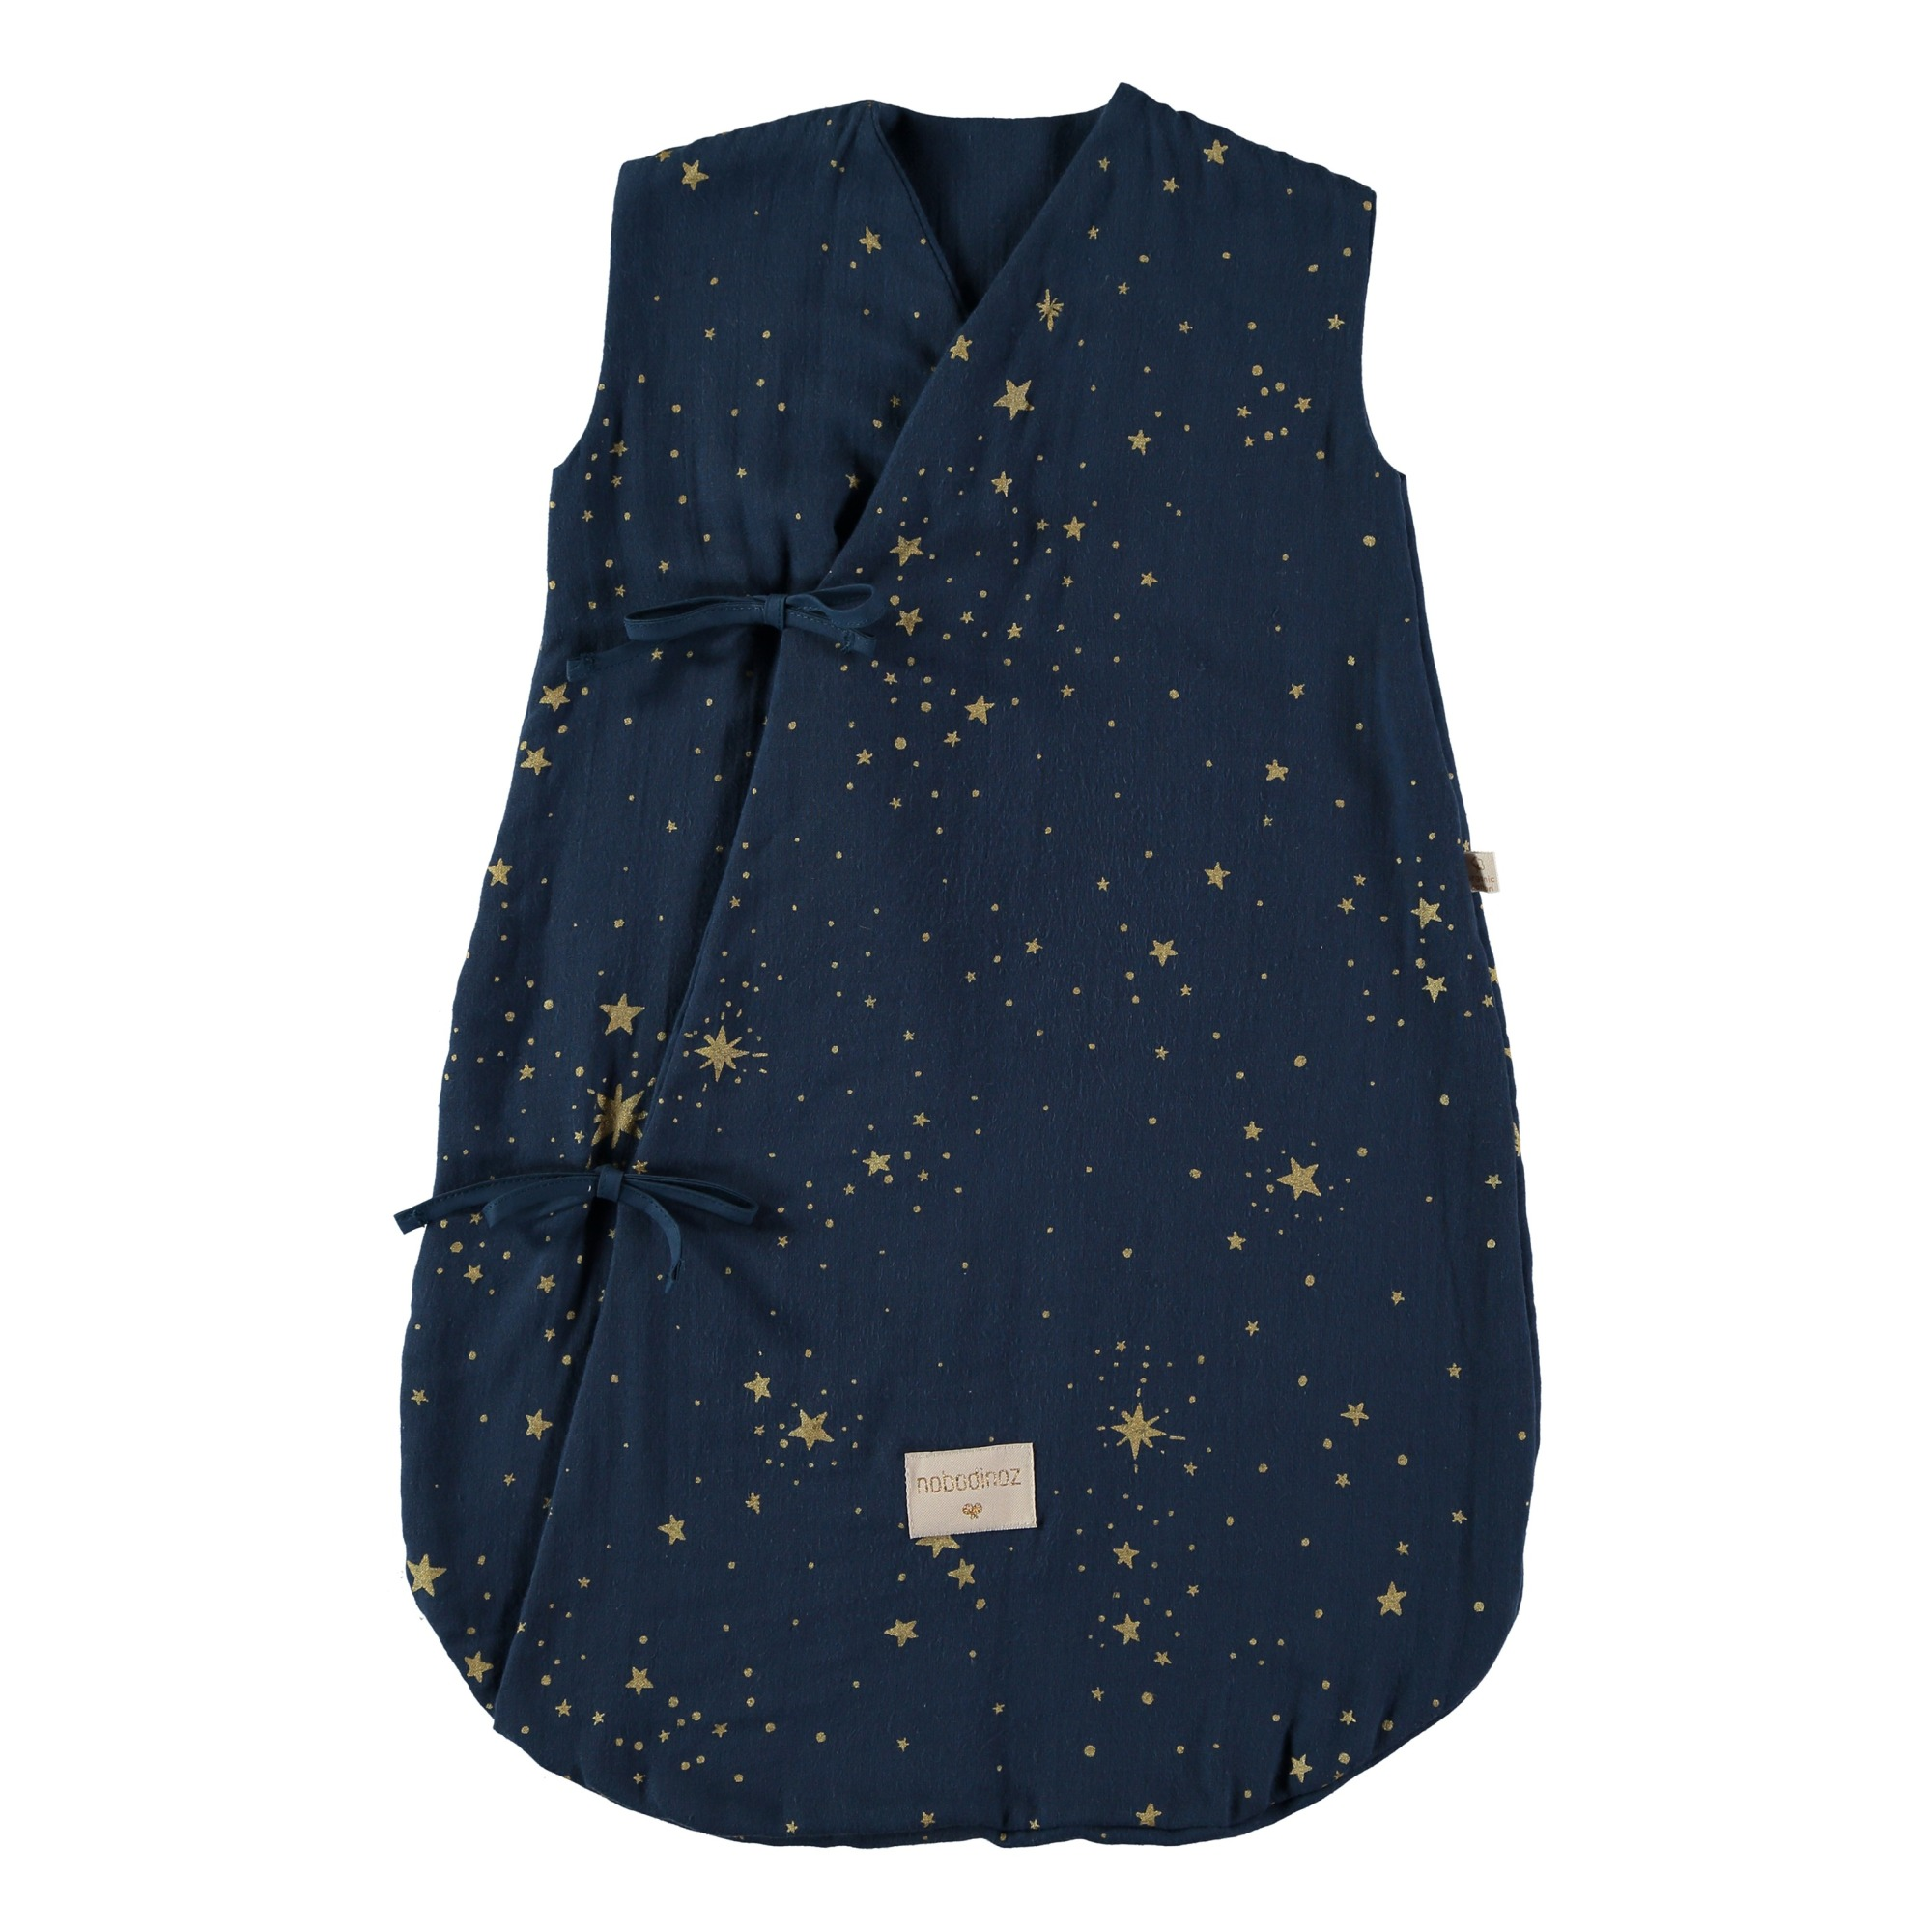 be7d000c1ff1 Dreamy thin baby sleeping bag in organic cotton Nobodinoz Design